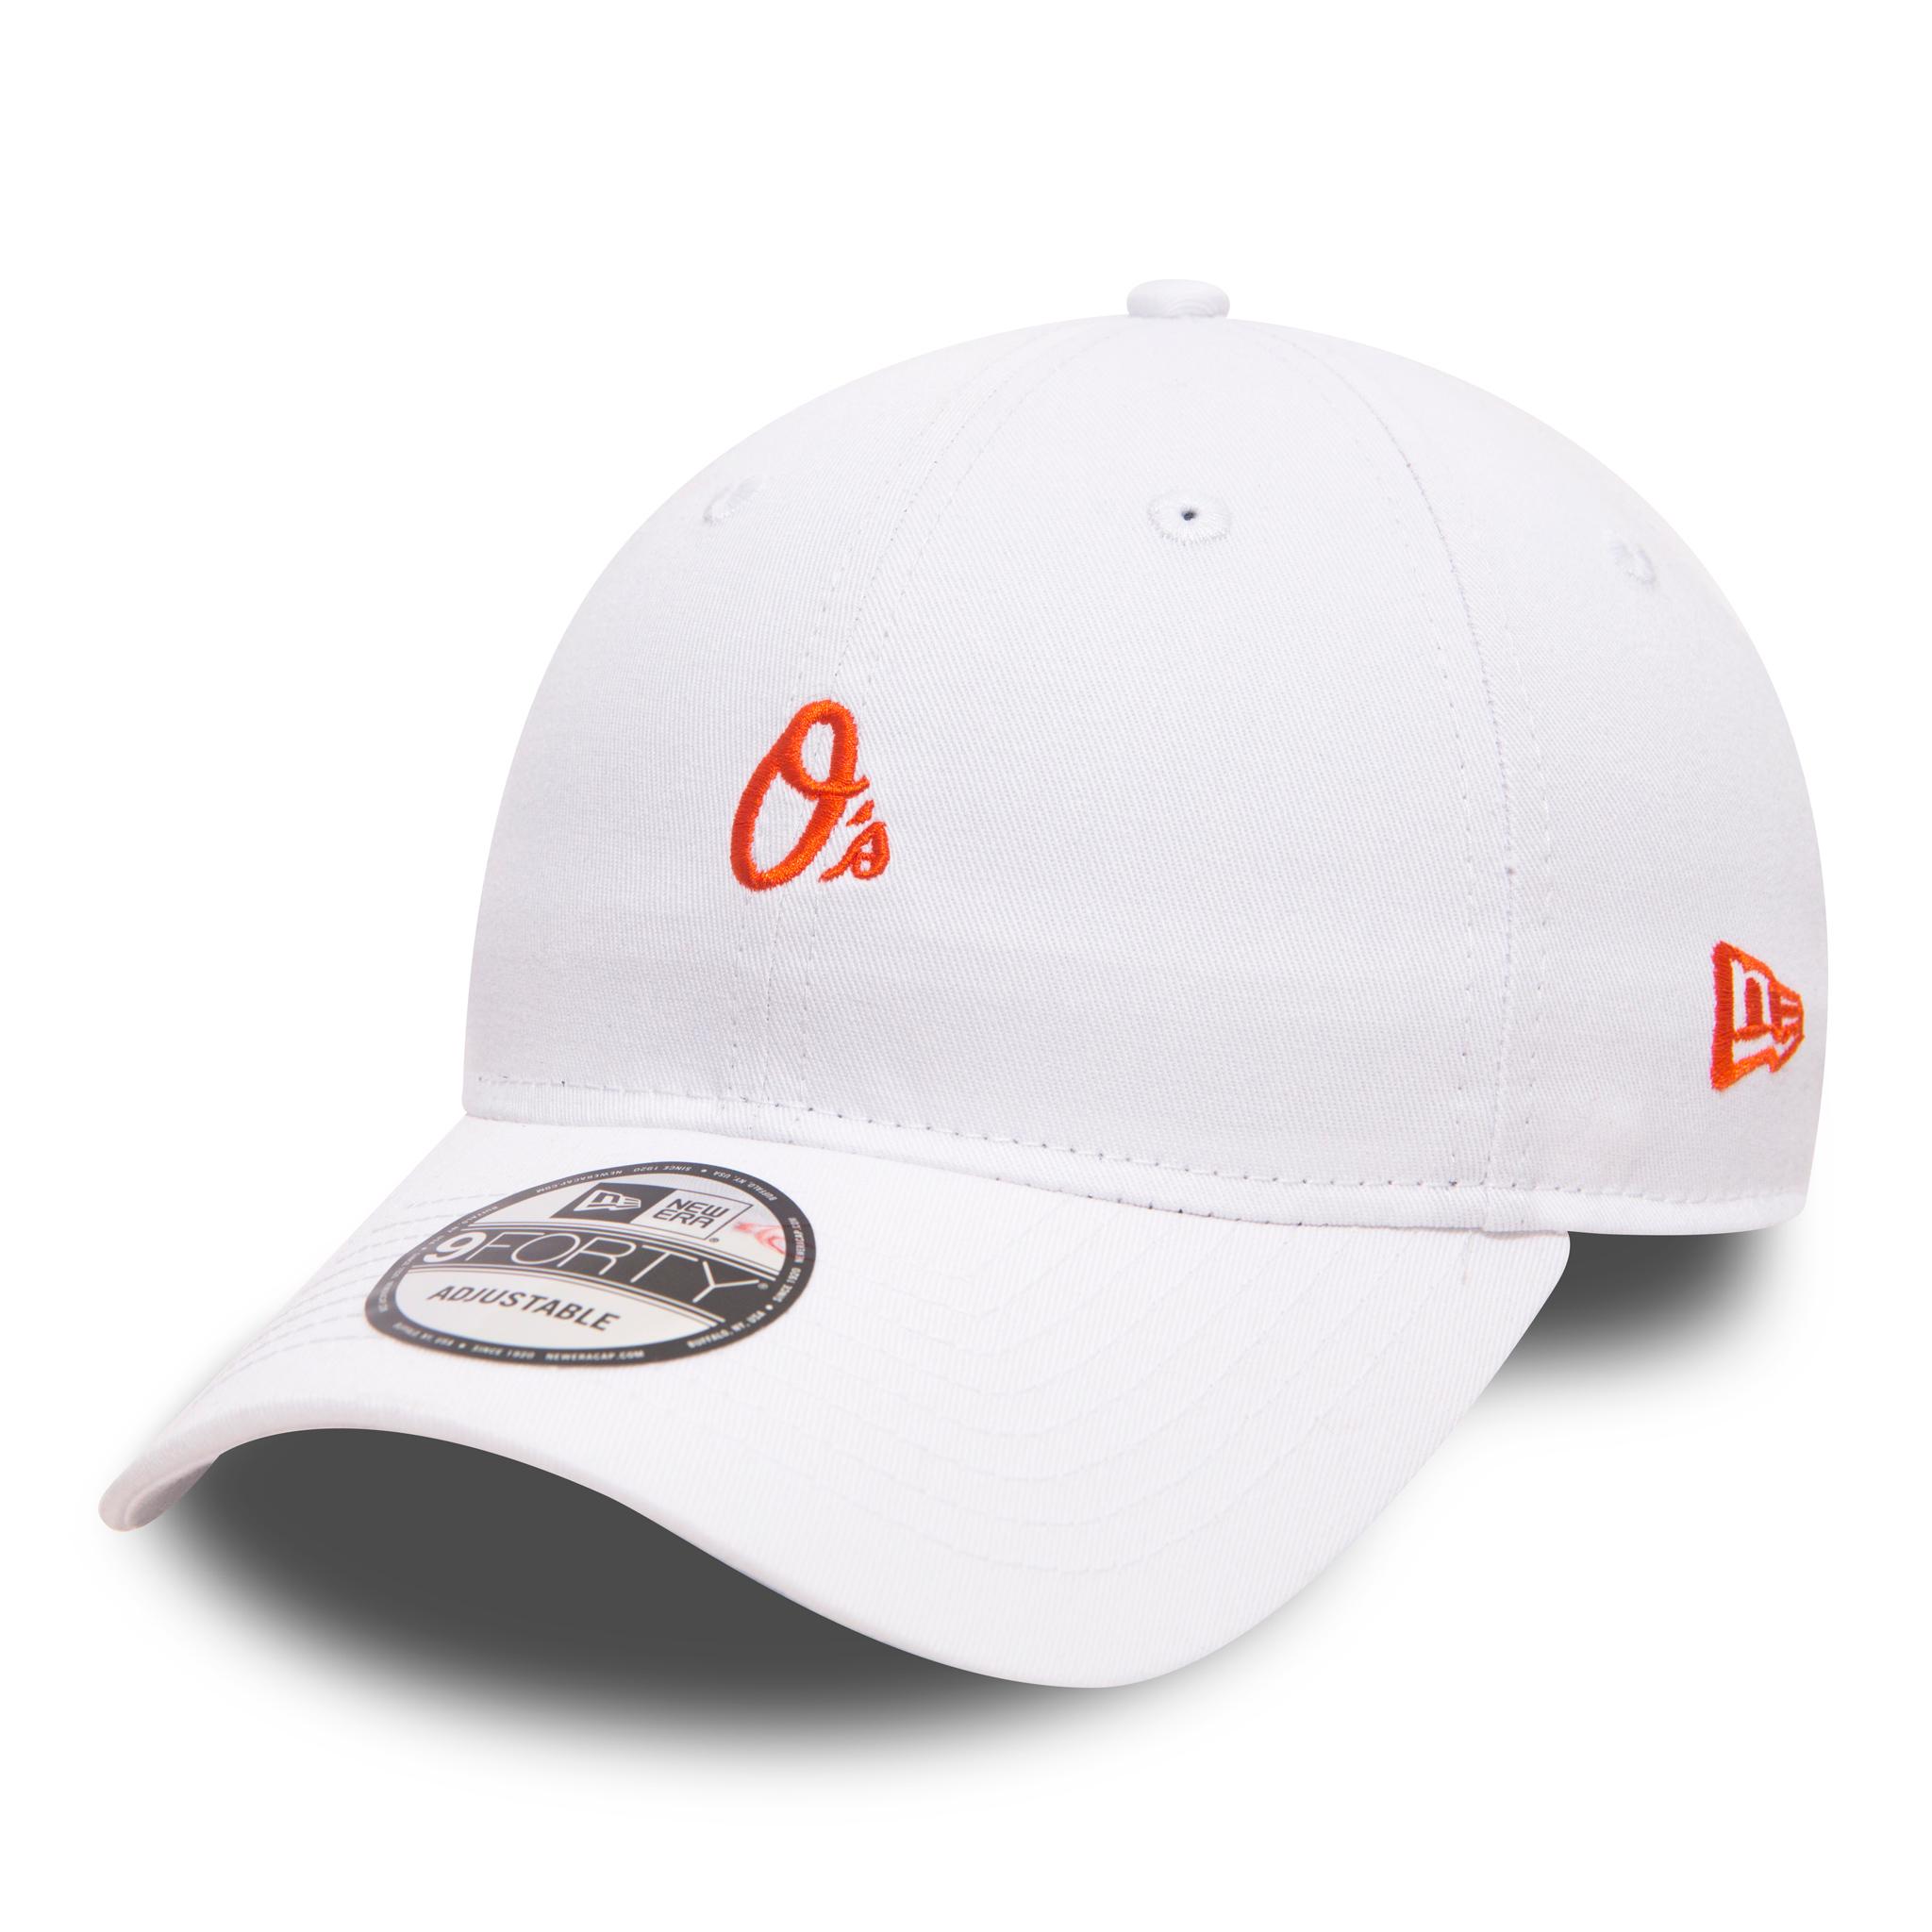 Gorra regulable 9FORTY de New Era con logotipo pequeño de los Baltimore Orioles